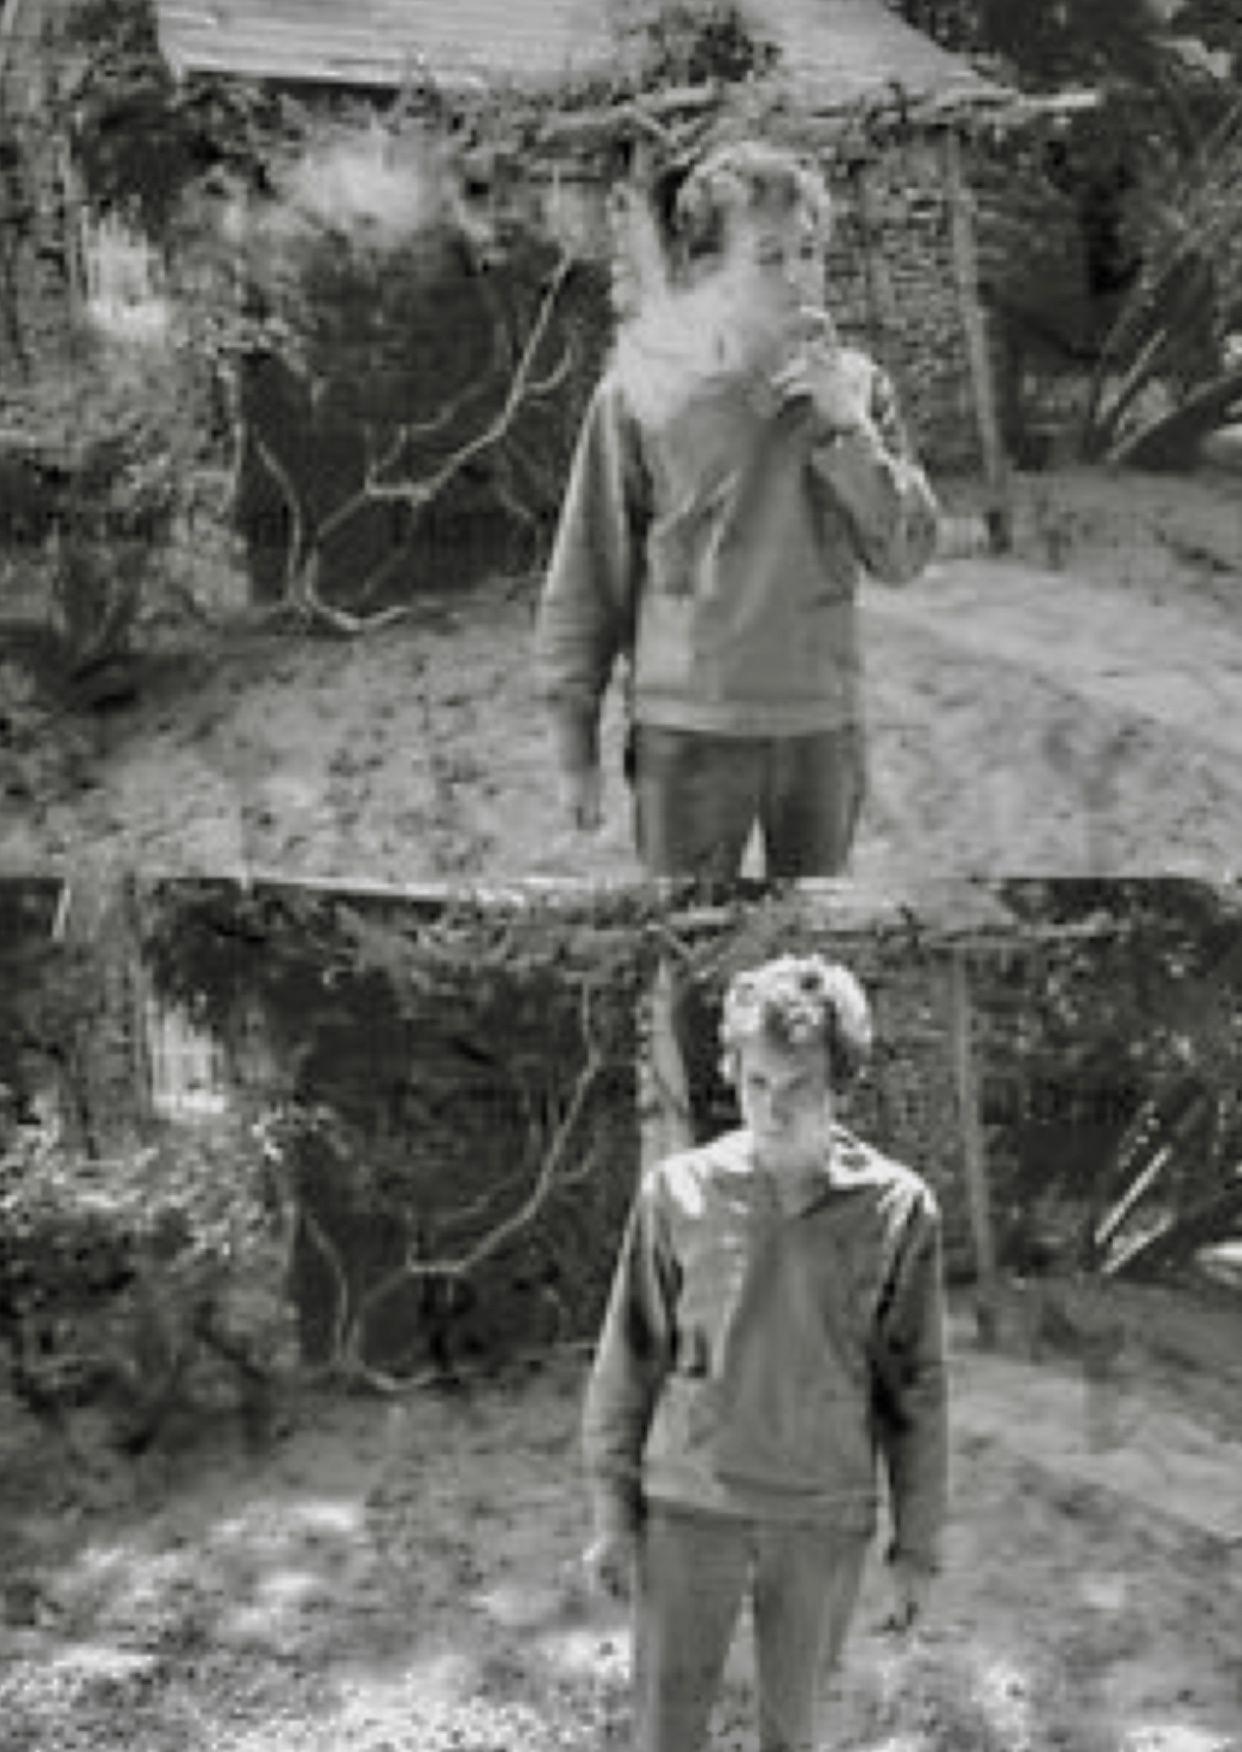 Bob Dylan Having A Smoke In His Backyard | Dylan, Bob ...